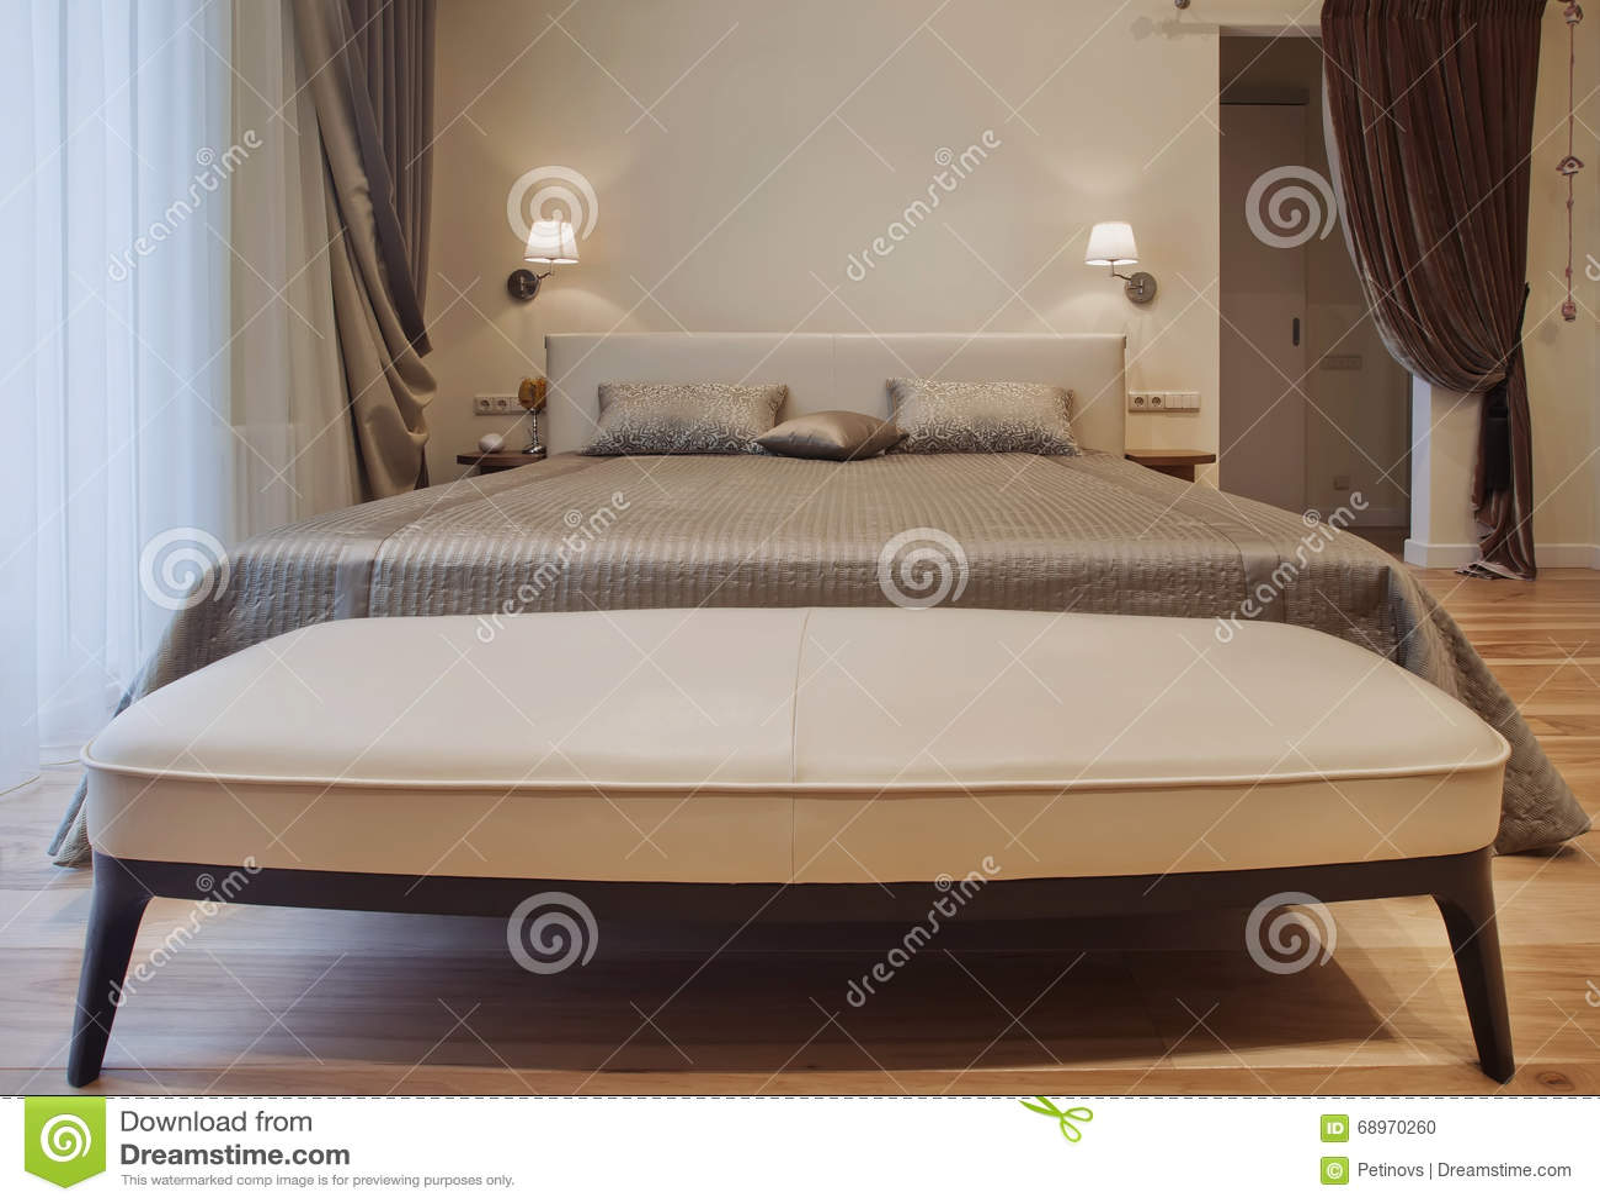 Interior Design Series Of Nice Cozy Bedroom Stock Photo